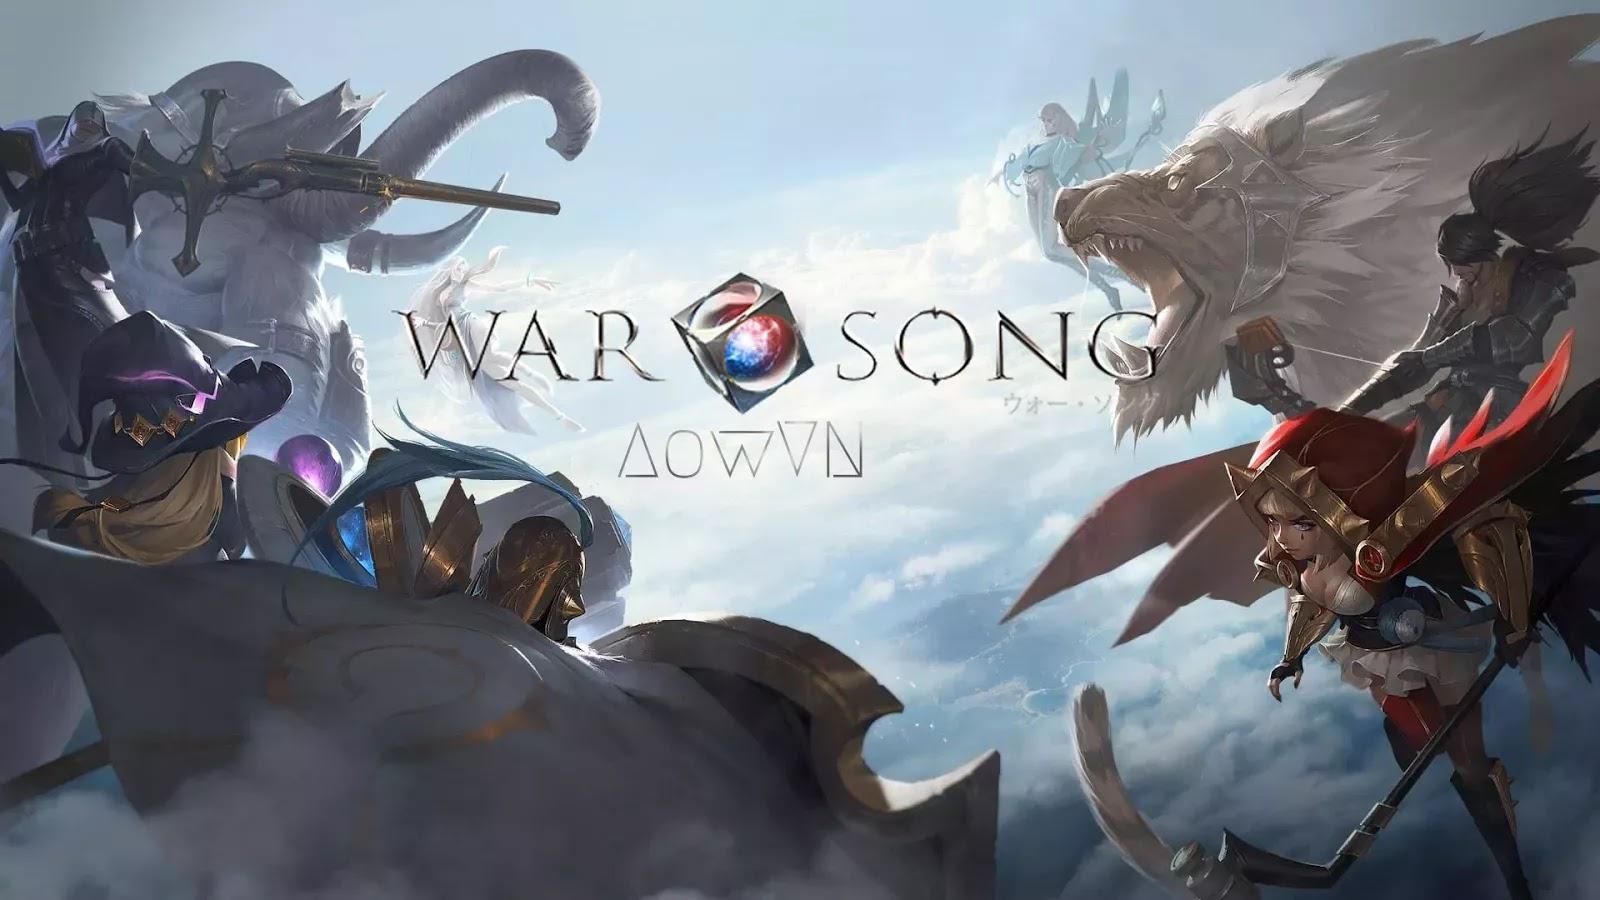 AowVN.org min WarSong%2B%252810%2529 - [ HOT ] War Song | Android & IOS -  Game MOBA Nhật tuyệt hay - Chính Thức Open